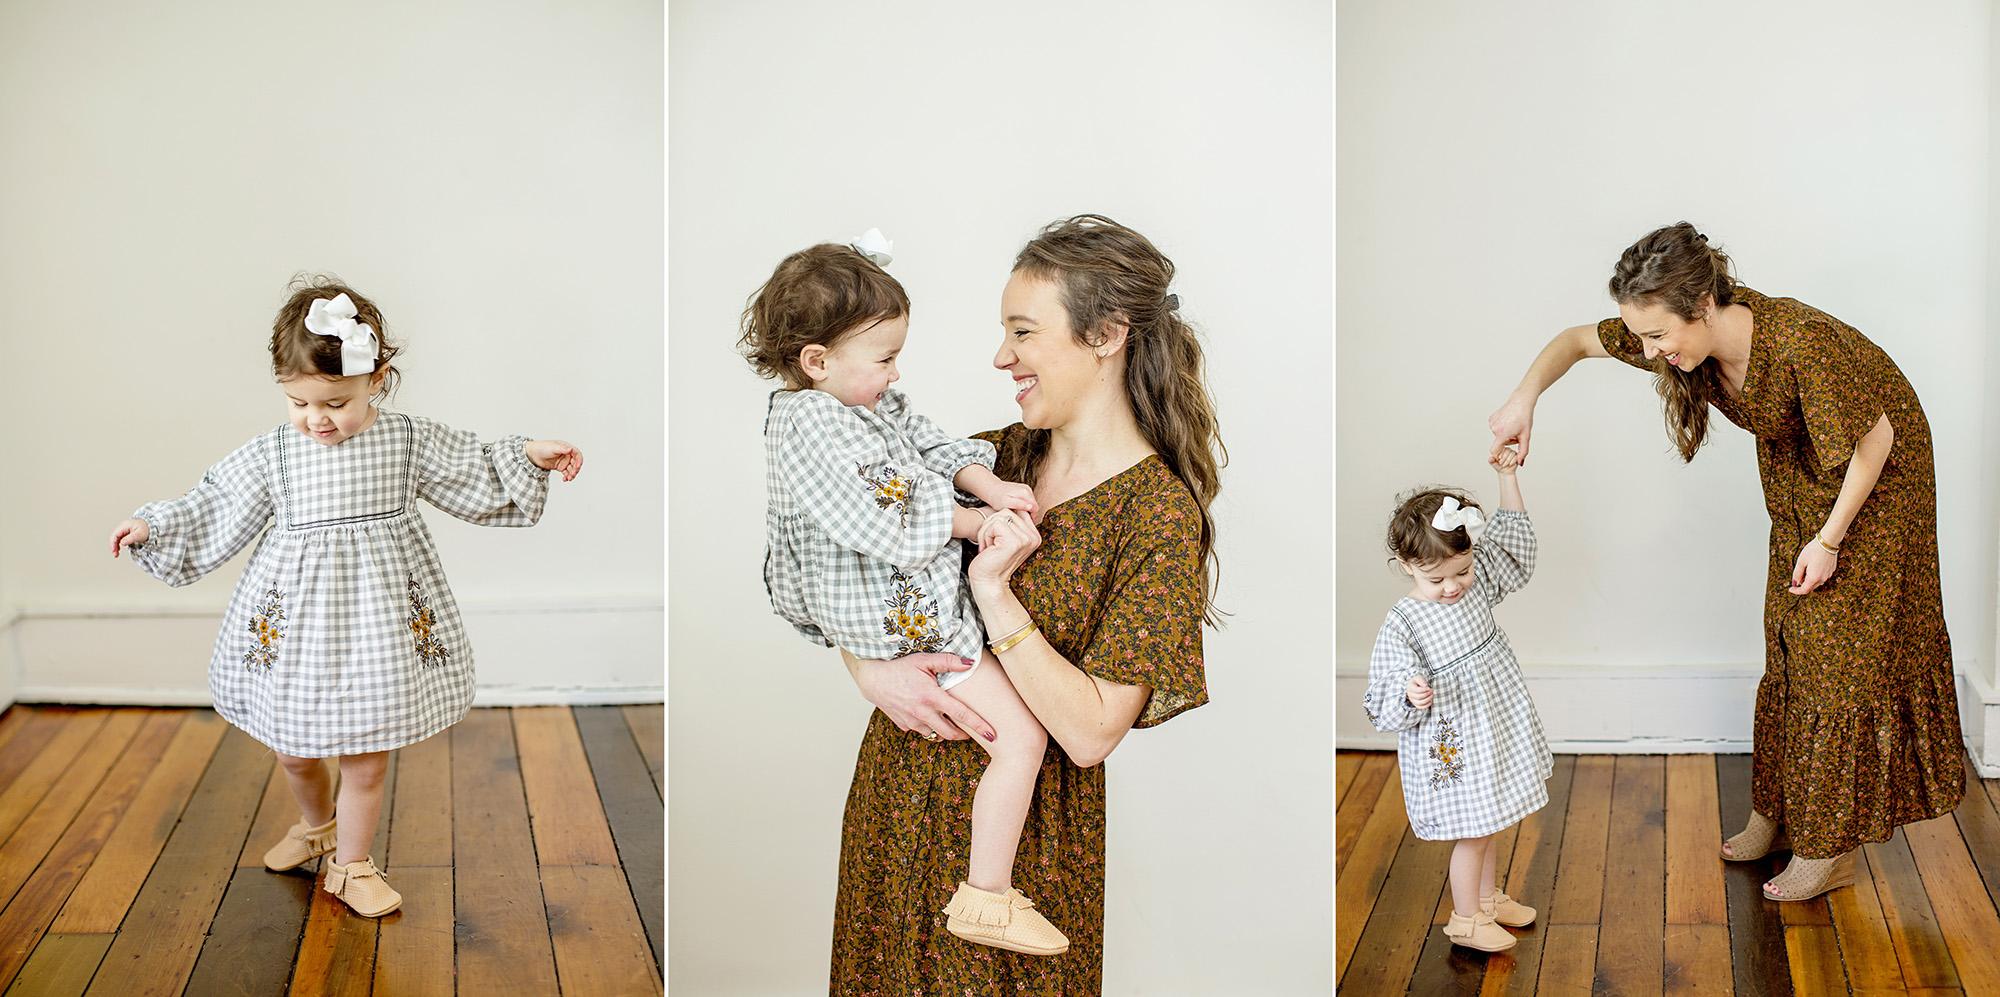 Seriously_Sabrina_Photography_Lexington_Kentucky_Studio_Lex_Portraits_Family_Oyler15.jpg